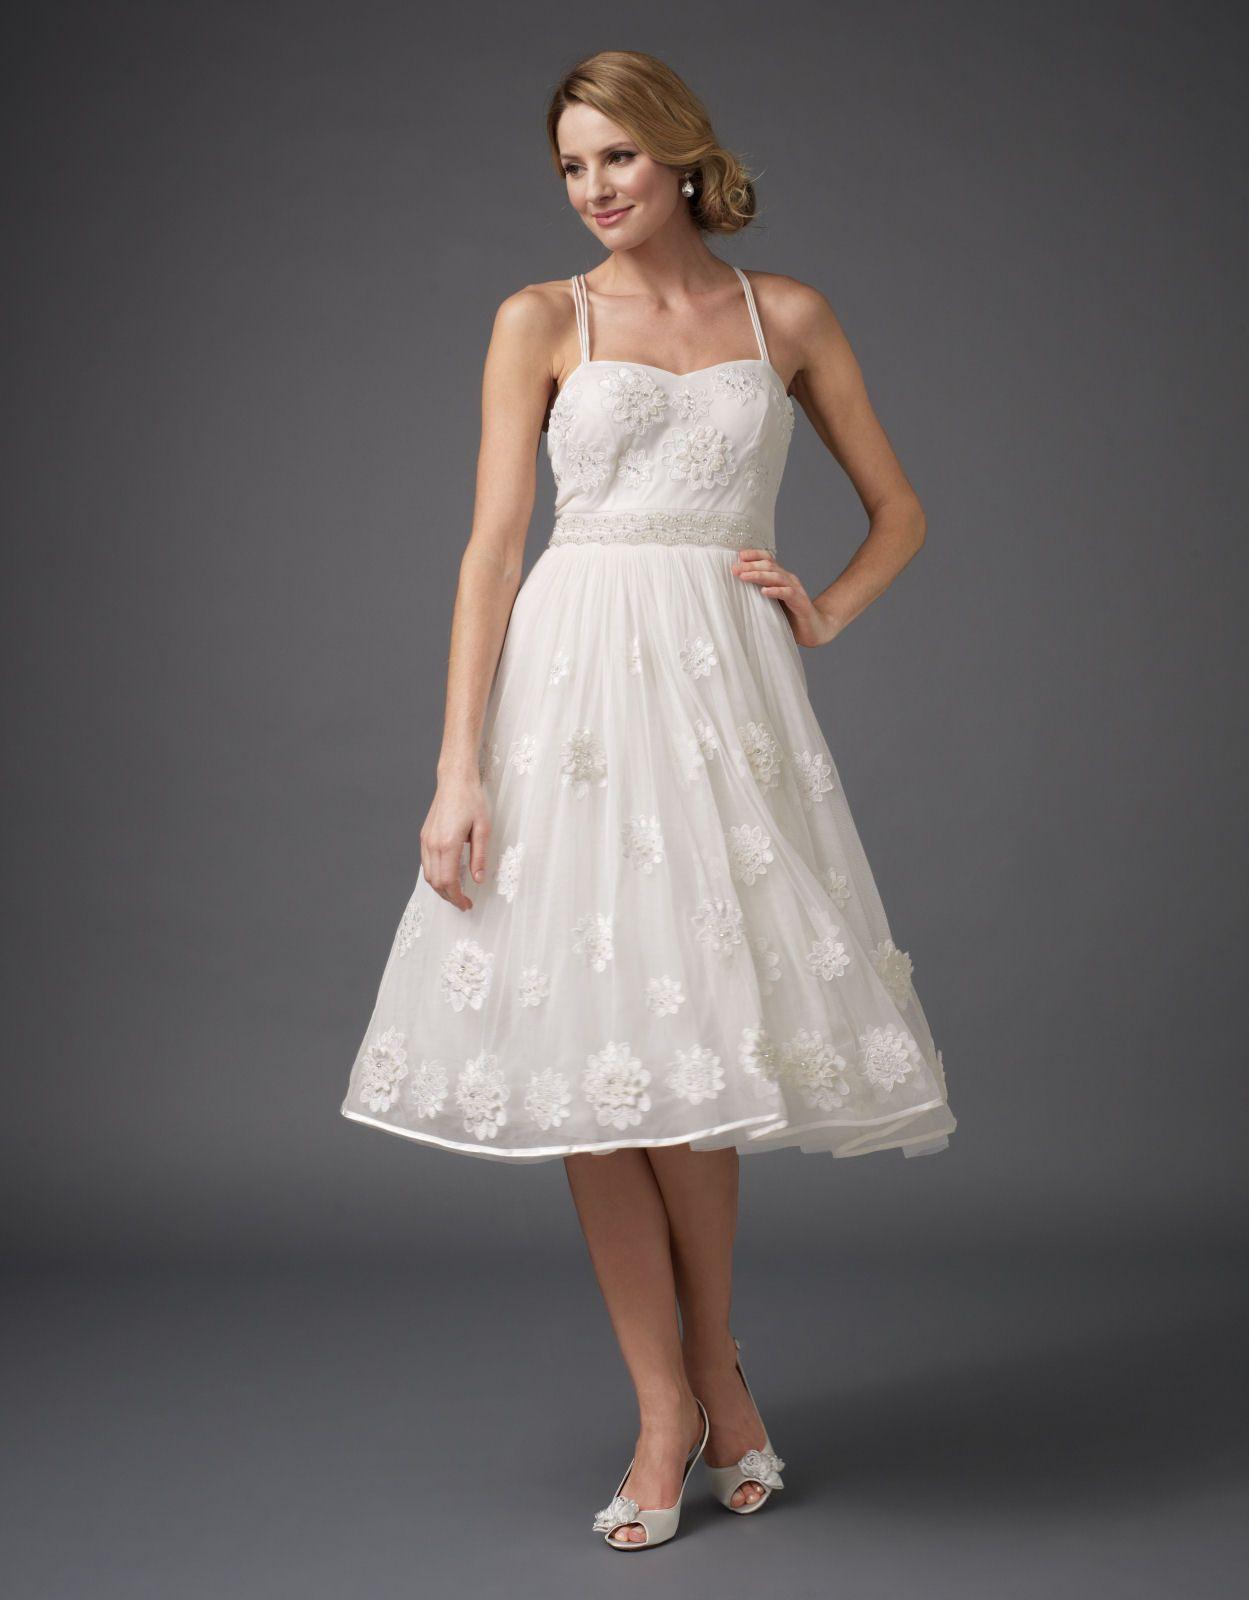 Orla Bridal Dress From Monsoon Bridal Short Bridal Dress Short Wedding Dress Monsoon Wedding Dresses